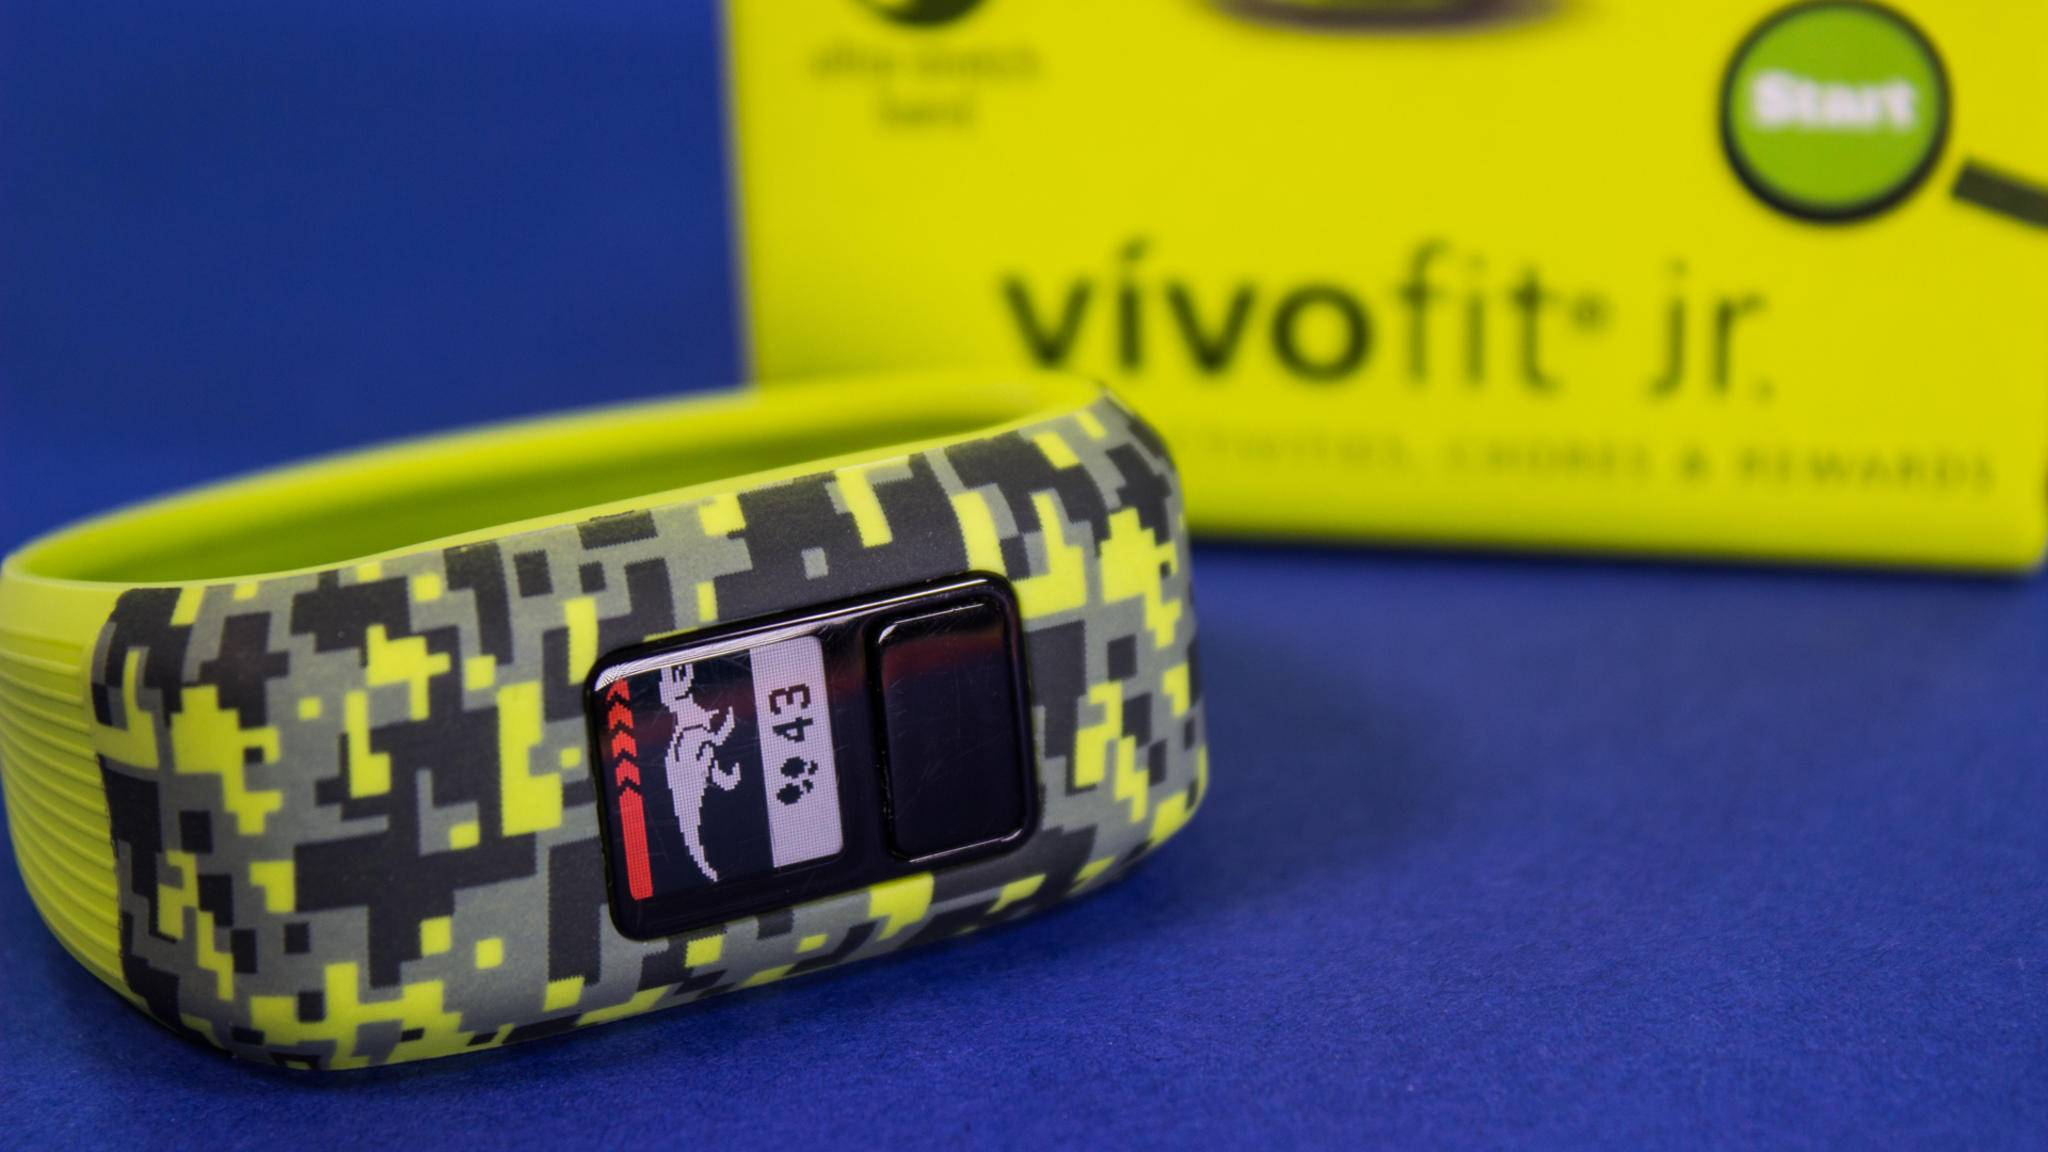 Fitness-Tracker für Kinder: Der Vivofit jr.